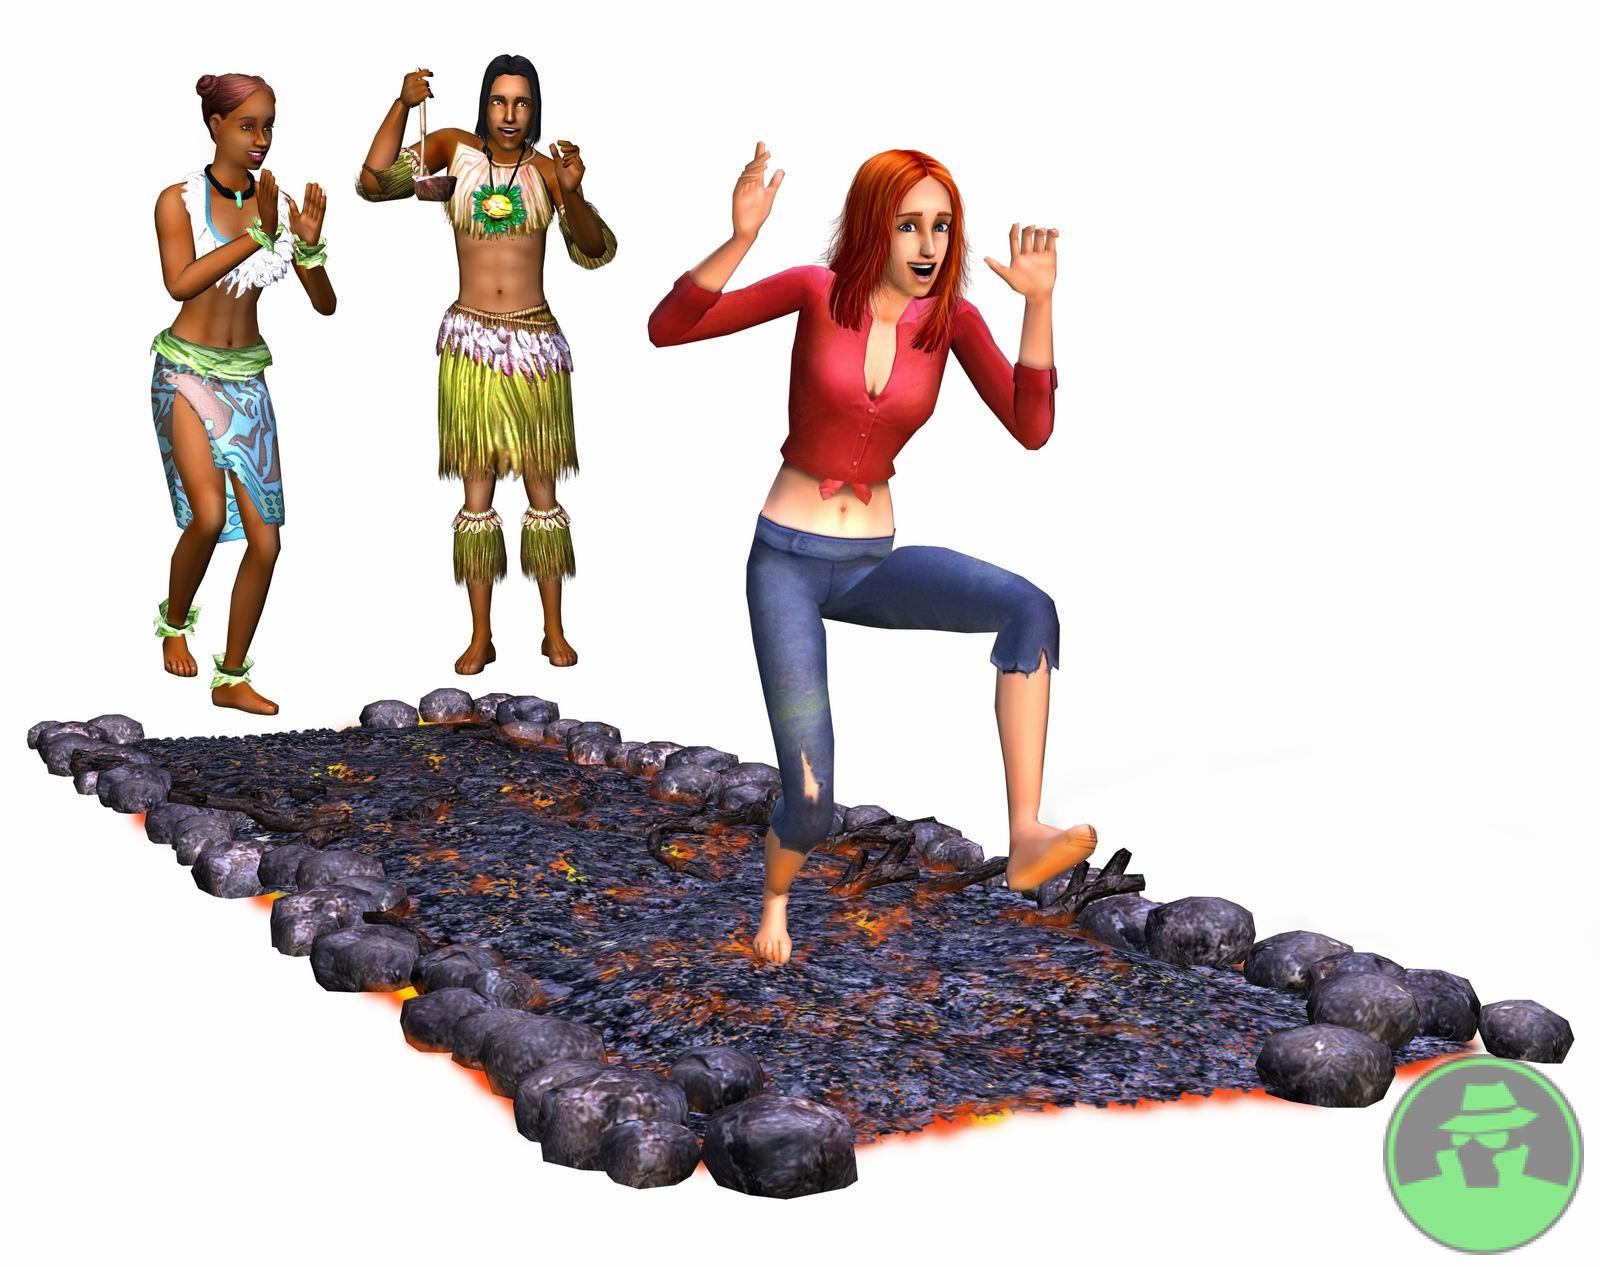 Sims 4 nagie nude scene